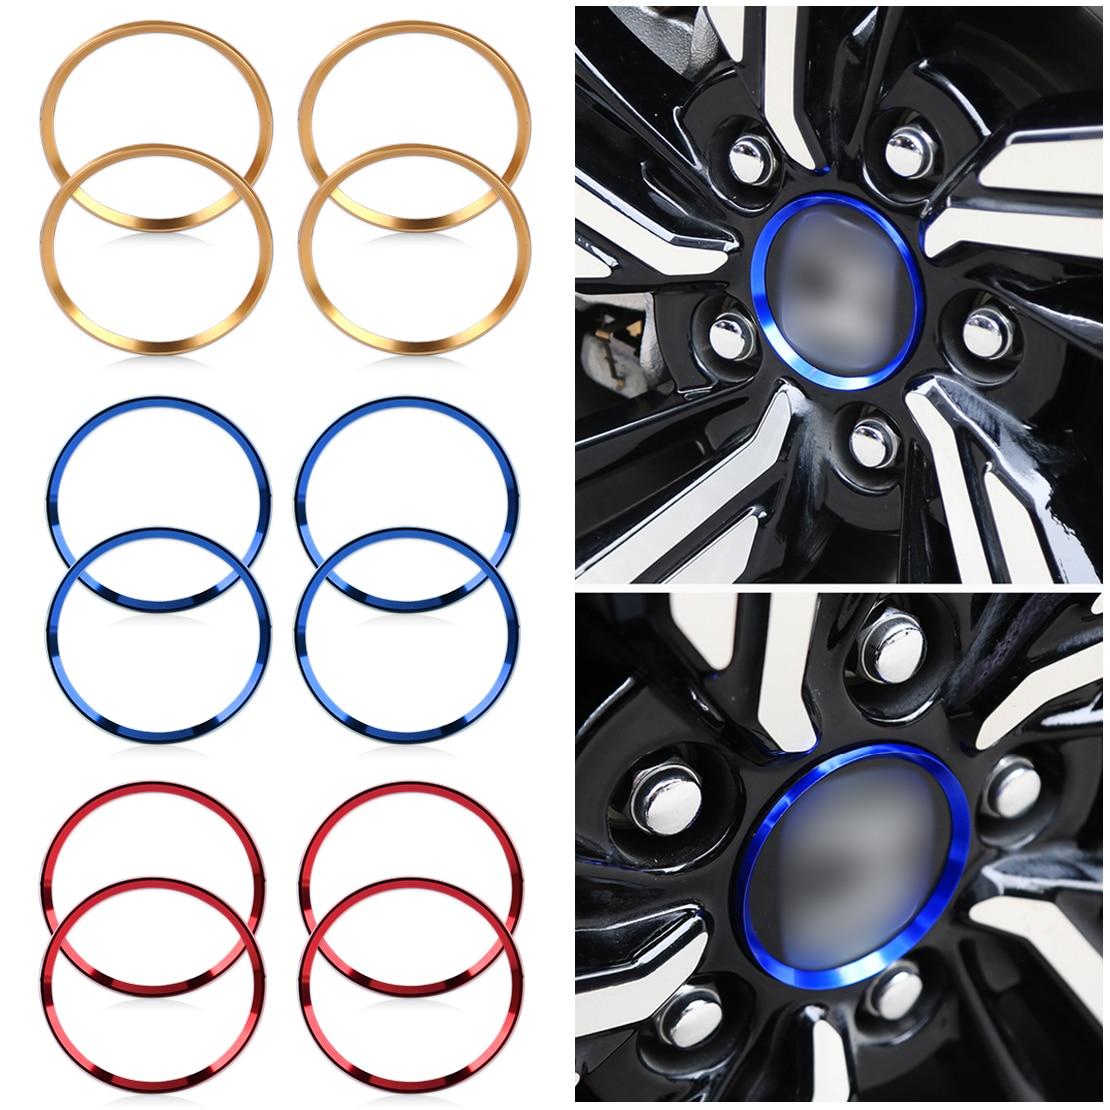 Blue Aluminium Alloy Wheel Center Hub Ring Trim For Honda CIVIC 2016-2017 2018